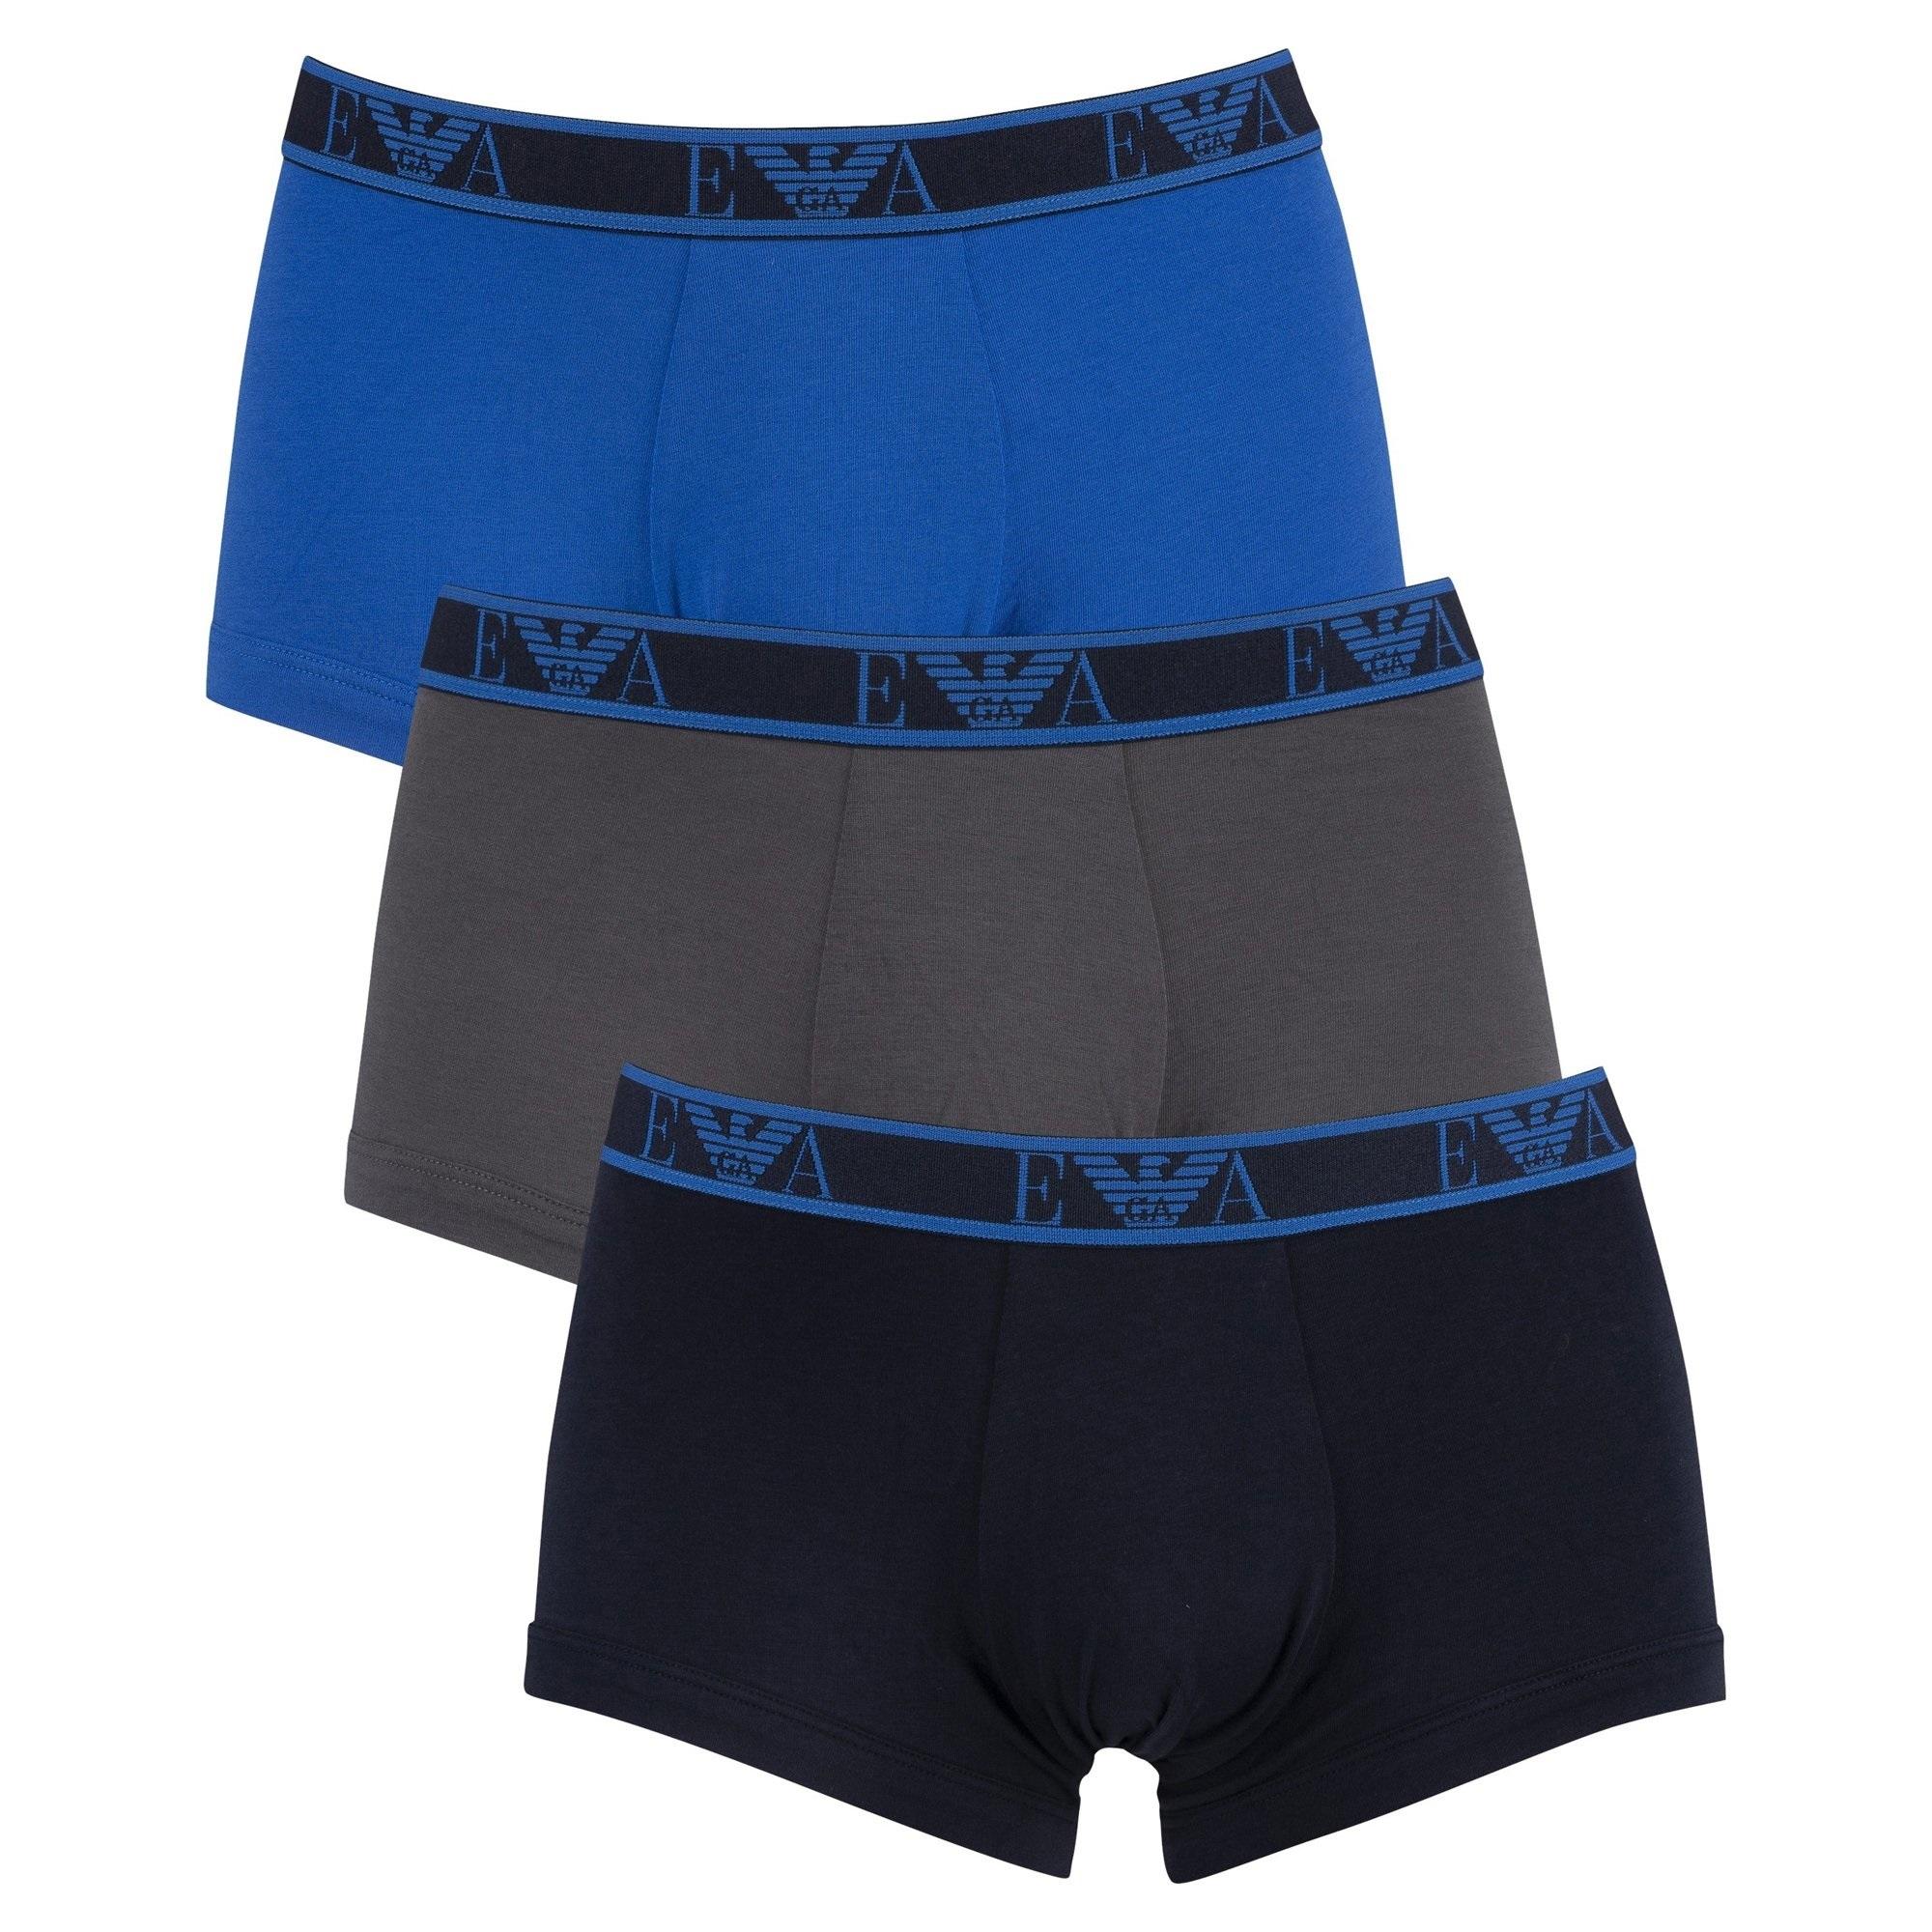 Emporio Armani Boxer 3-Pack, Effen